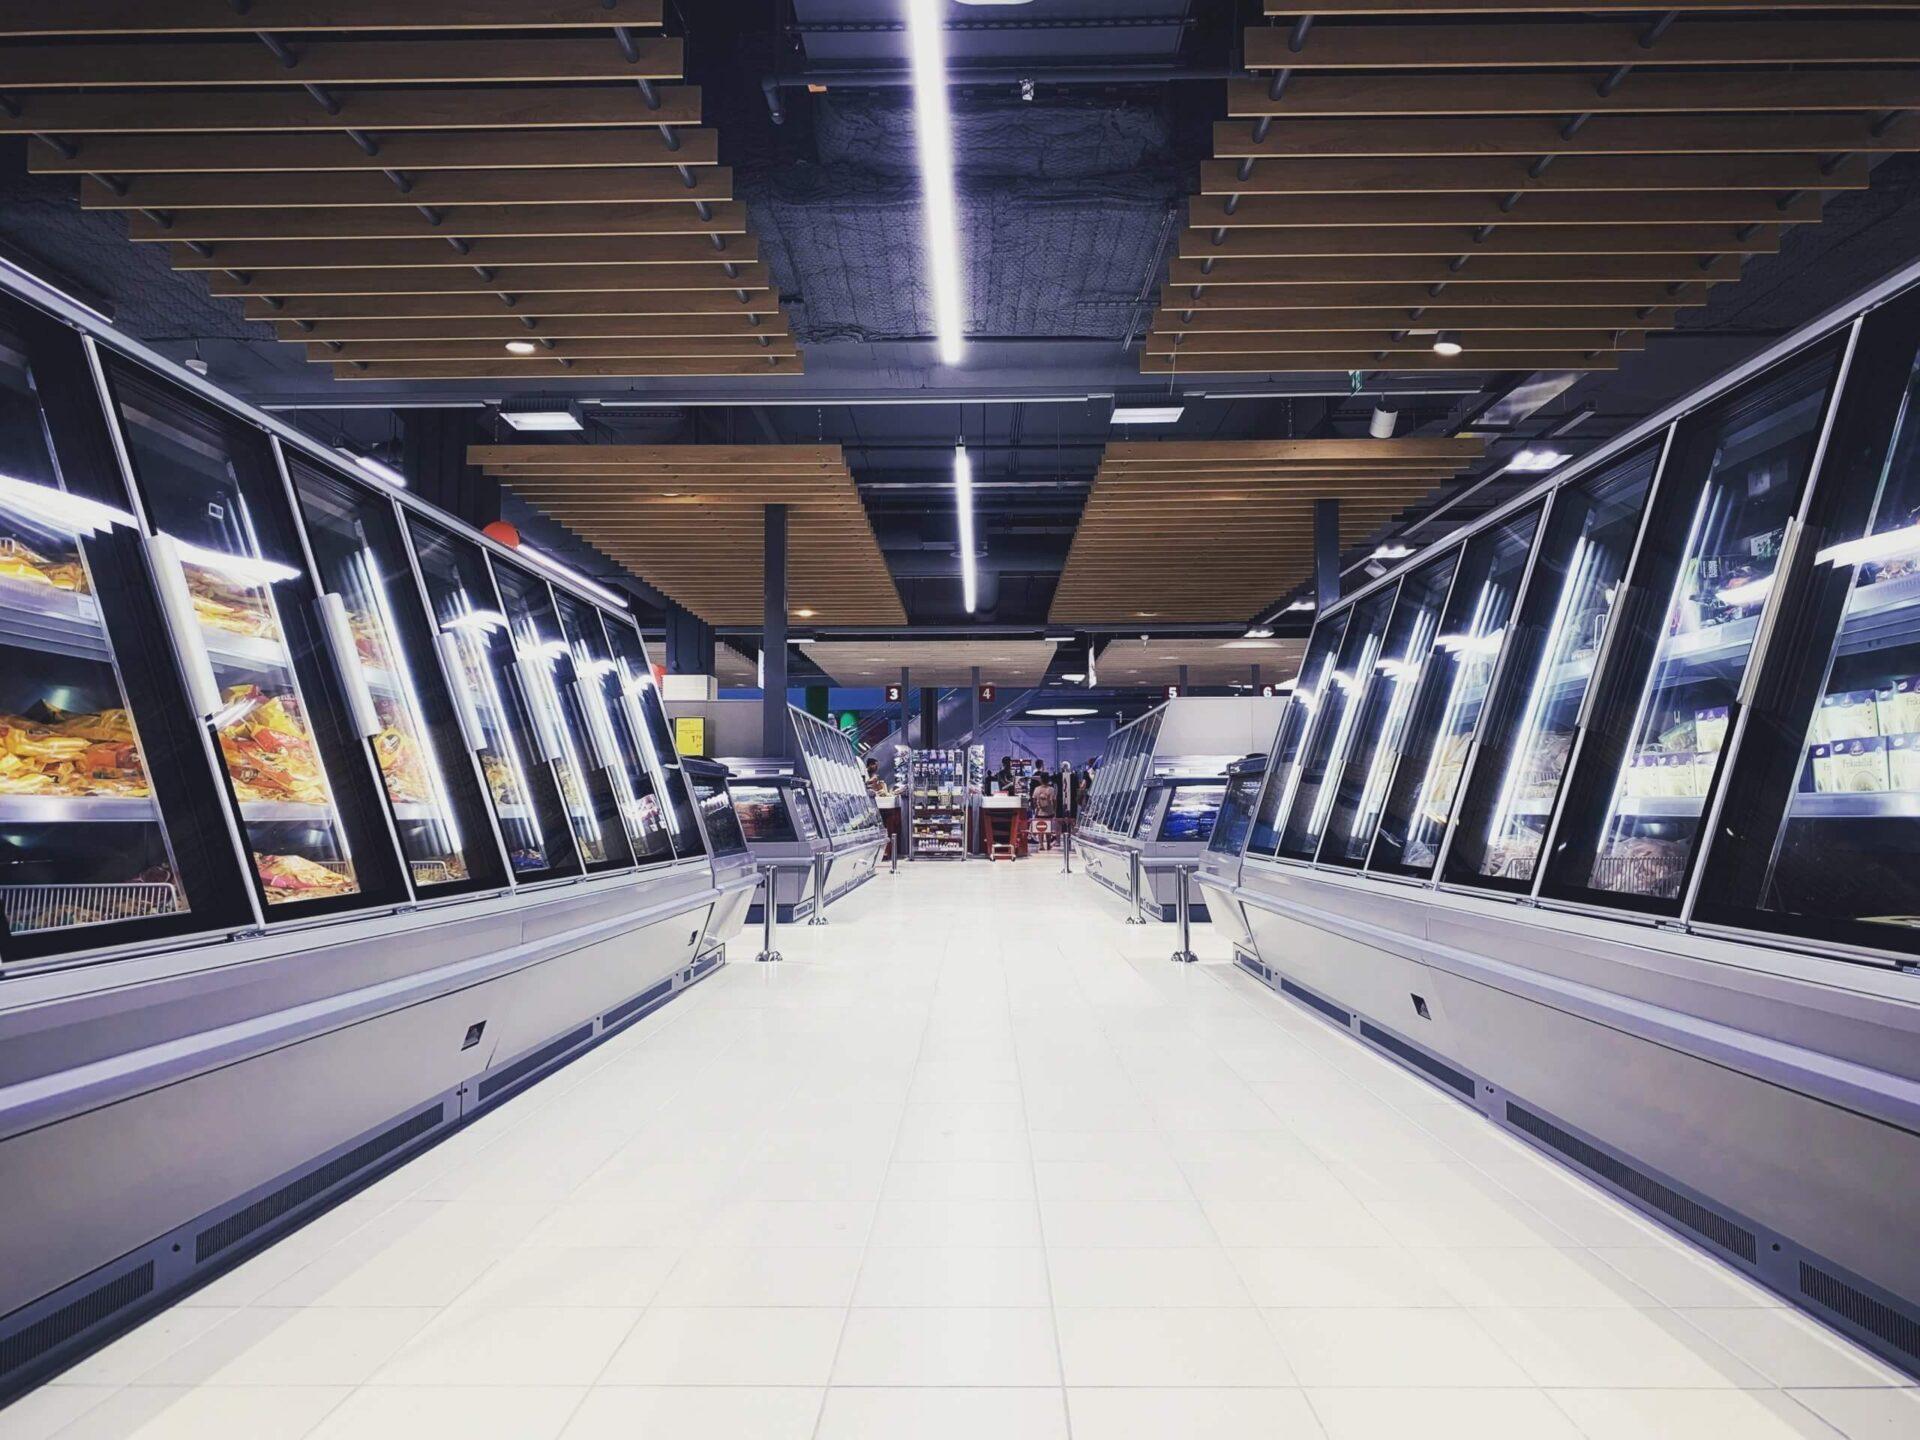 ilja-freiberg-FWRnXmQQV8U-unsplash-scaled 店舗デザインをお考えの方へ|効率を上げる飲食店のレイアウトとは